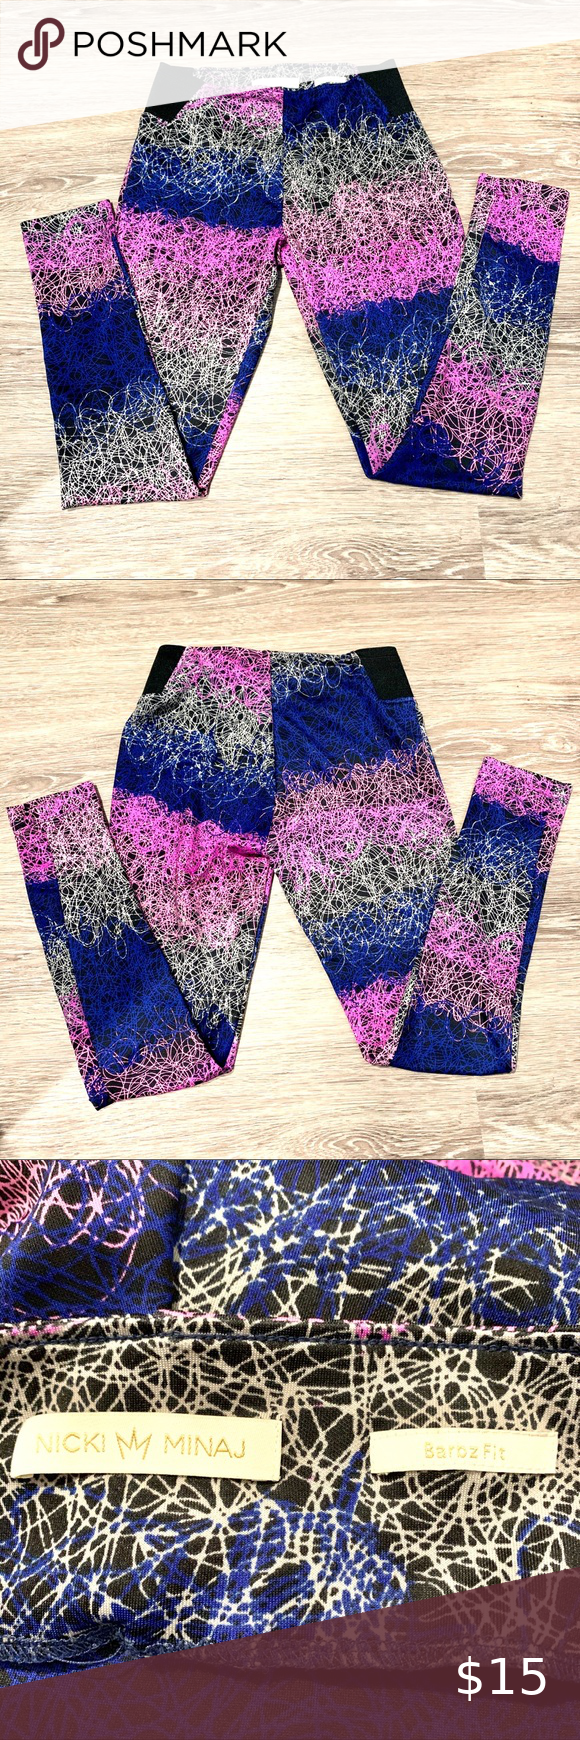 Nicki Minaj Pants Size M Clothes Design Pants For Women Colorful Leggings